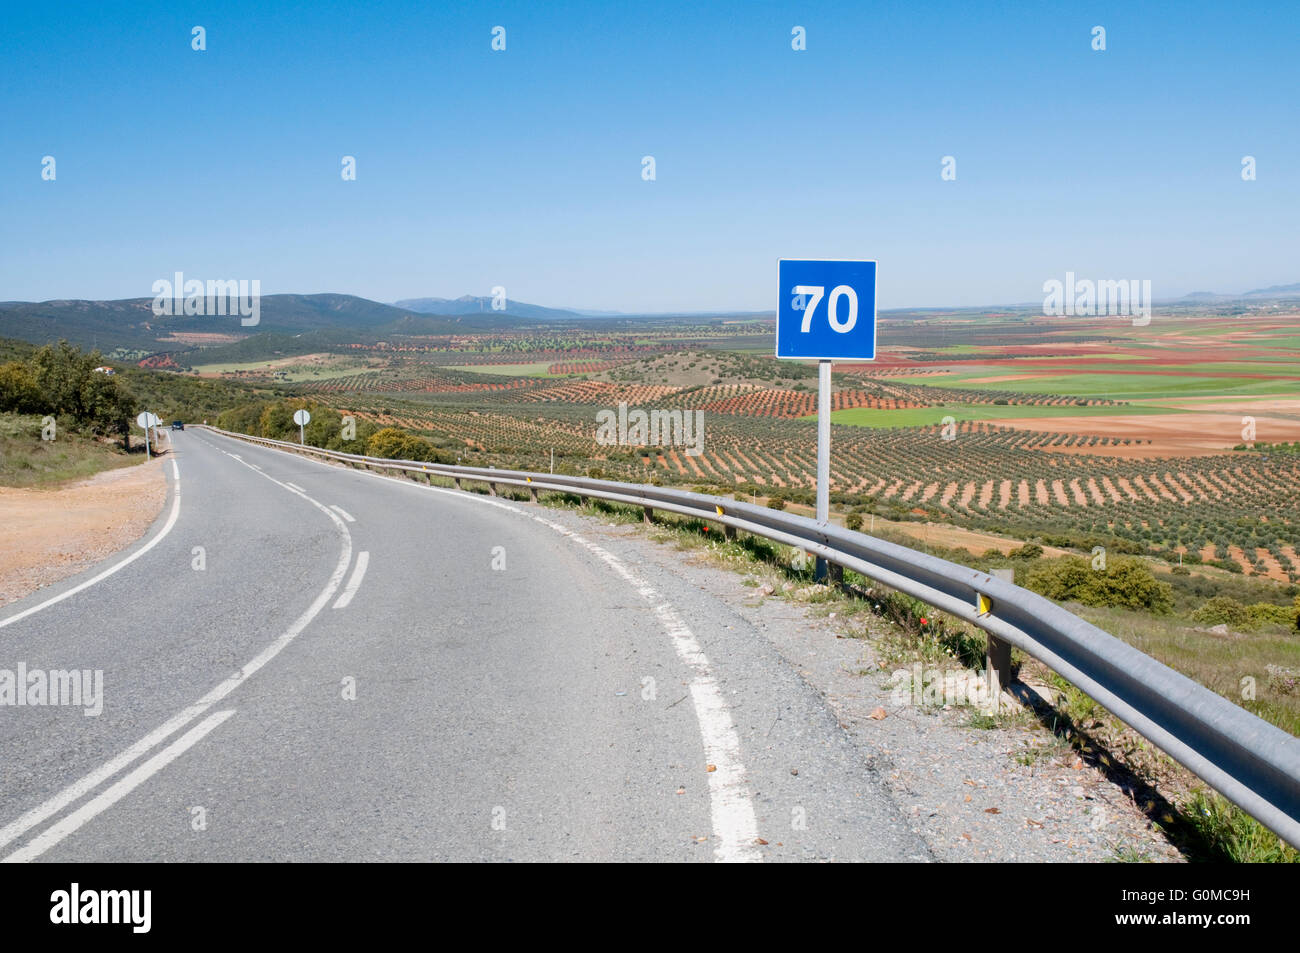 Road and road sign. Los Yebenes, Toledo province, Castilla La Mancha, Spain. Stock Photo